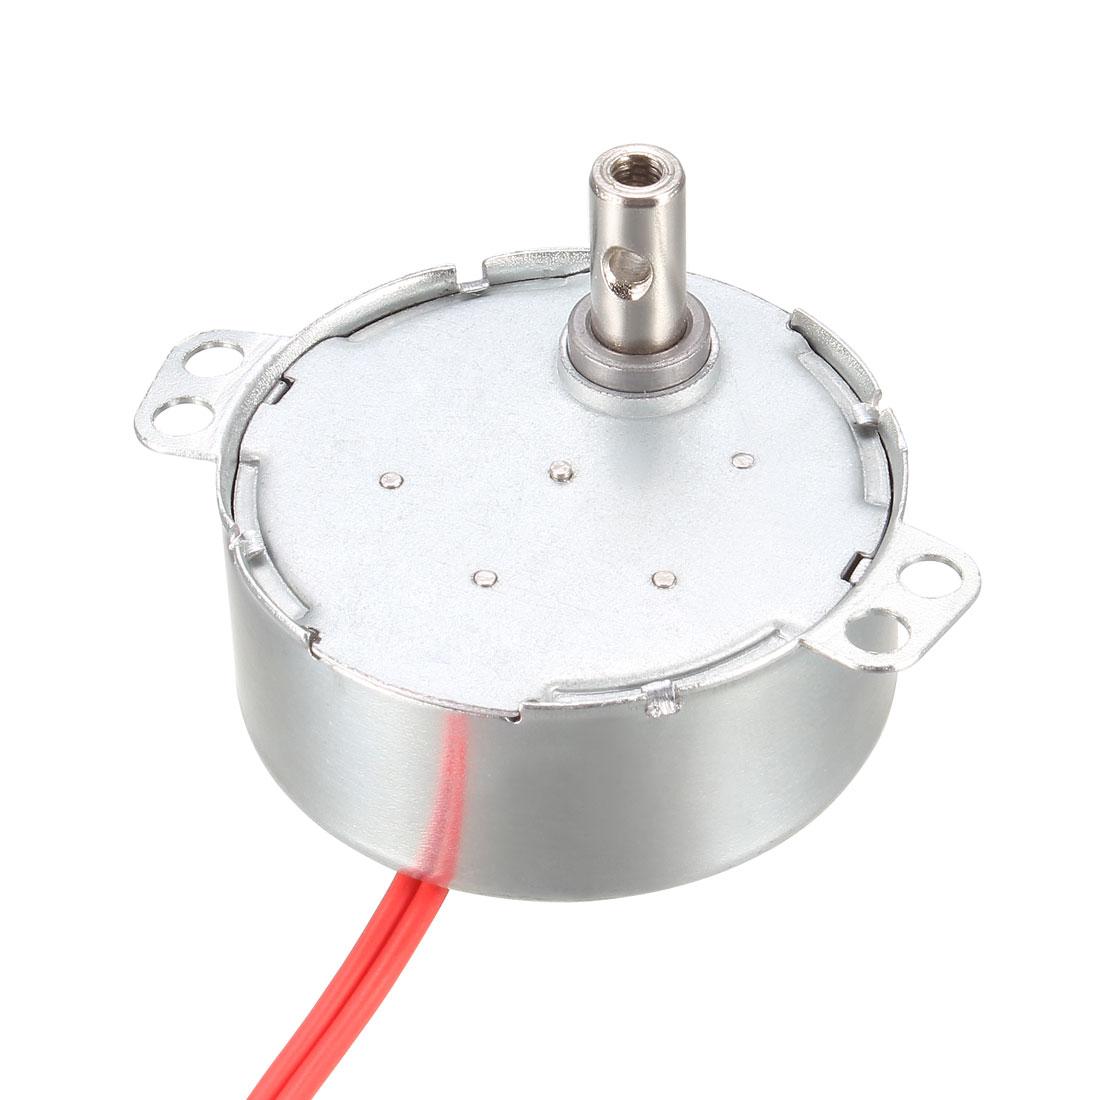 Synchronous Synchron Motor - Turntable Motor AC 12V 50-60Hz CCW/CW 4W 9-11RPM